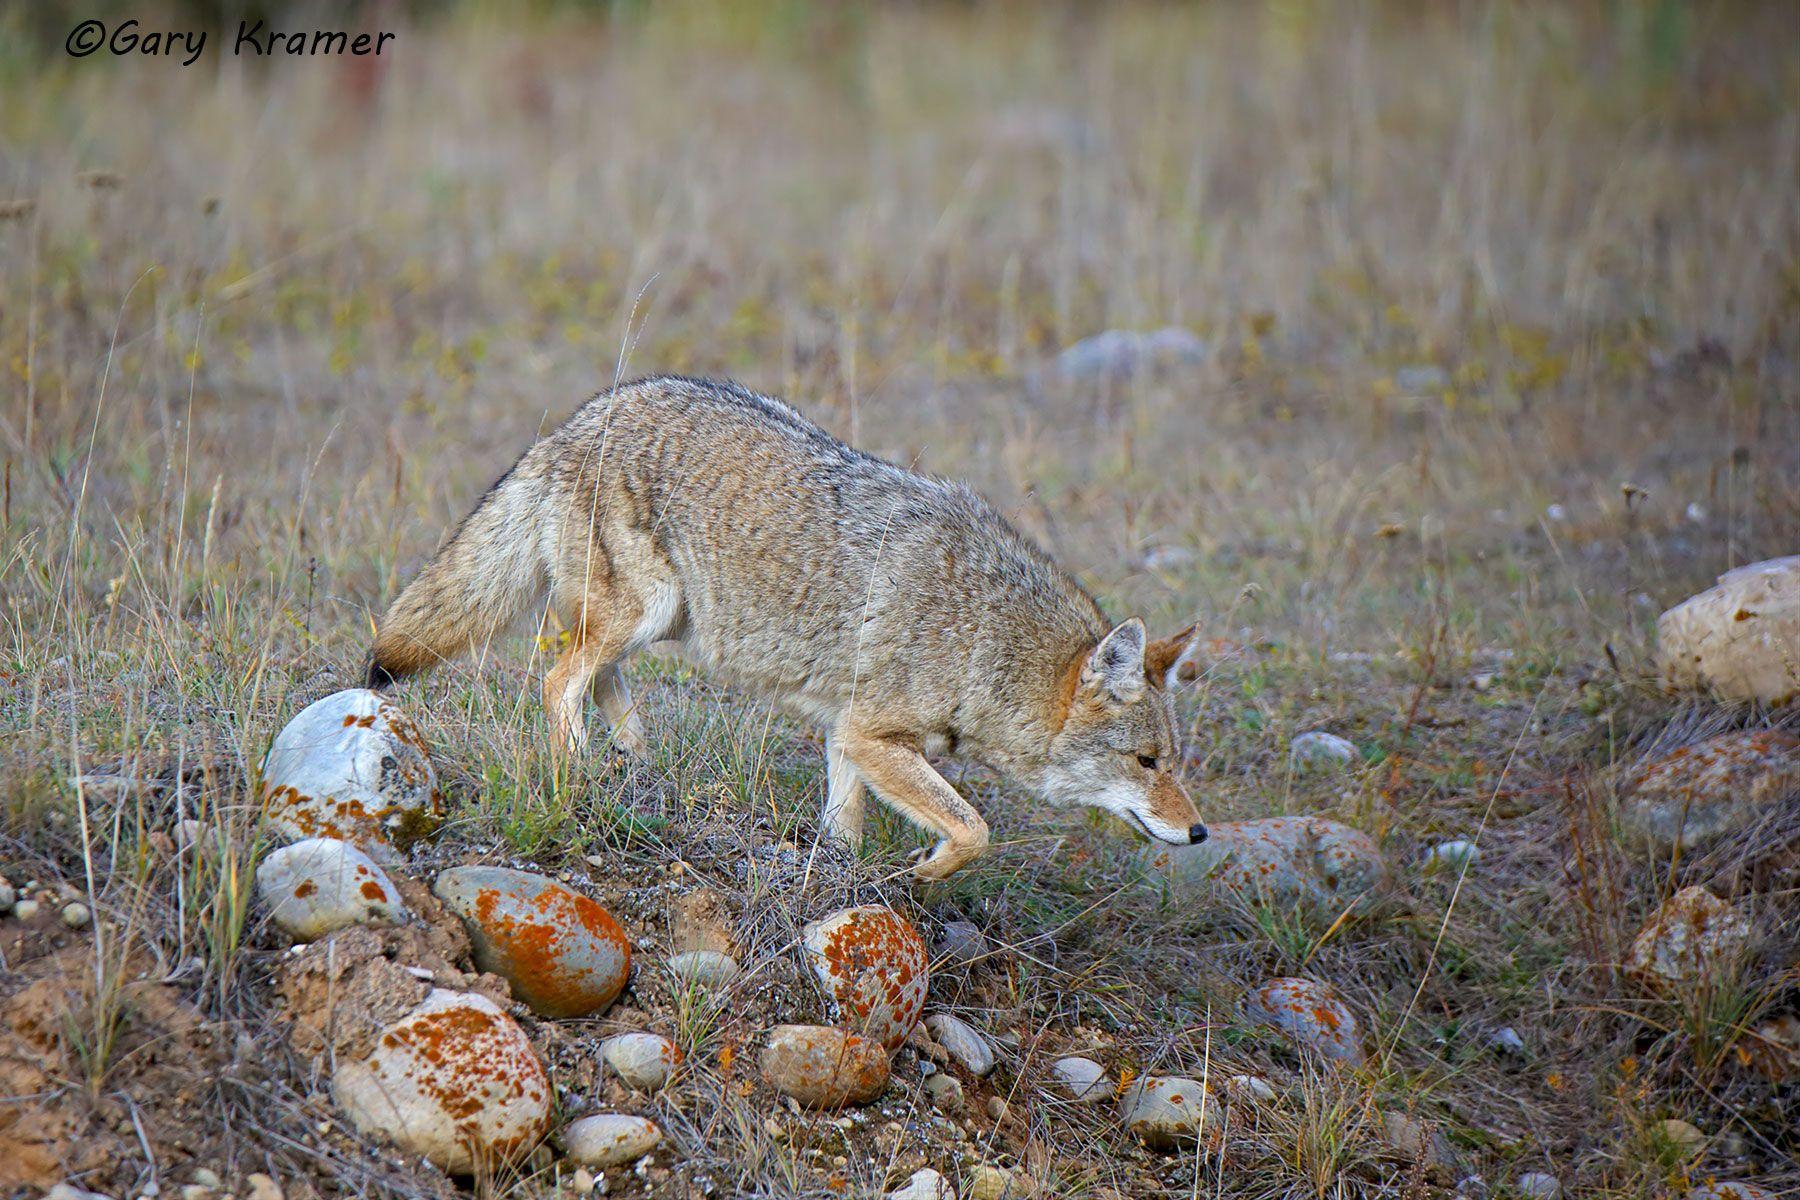 Coyote (Canis latrans) - NMC#1198d